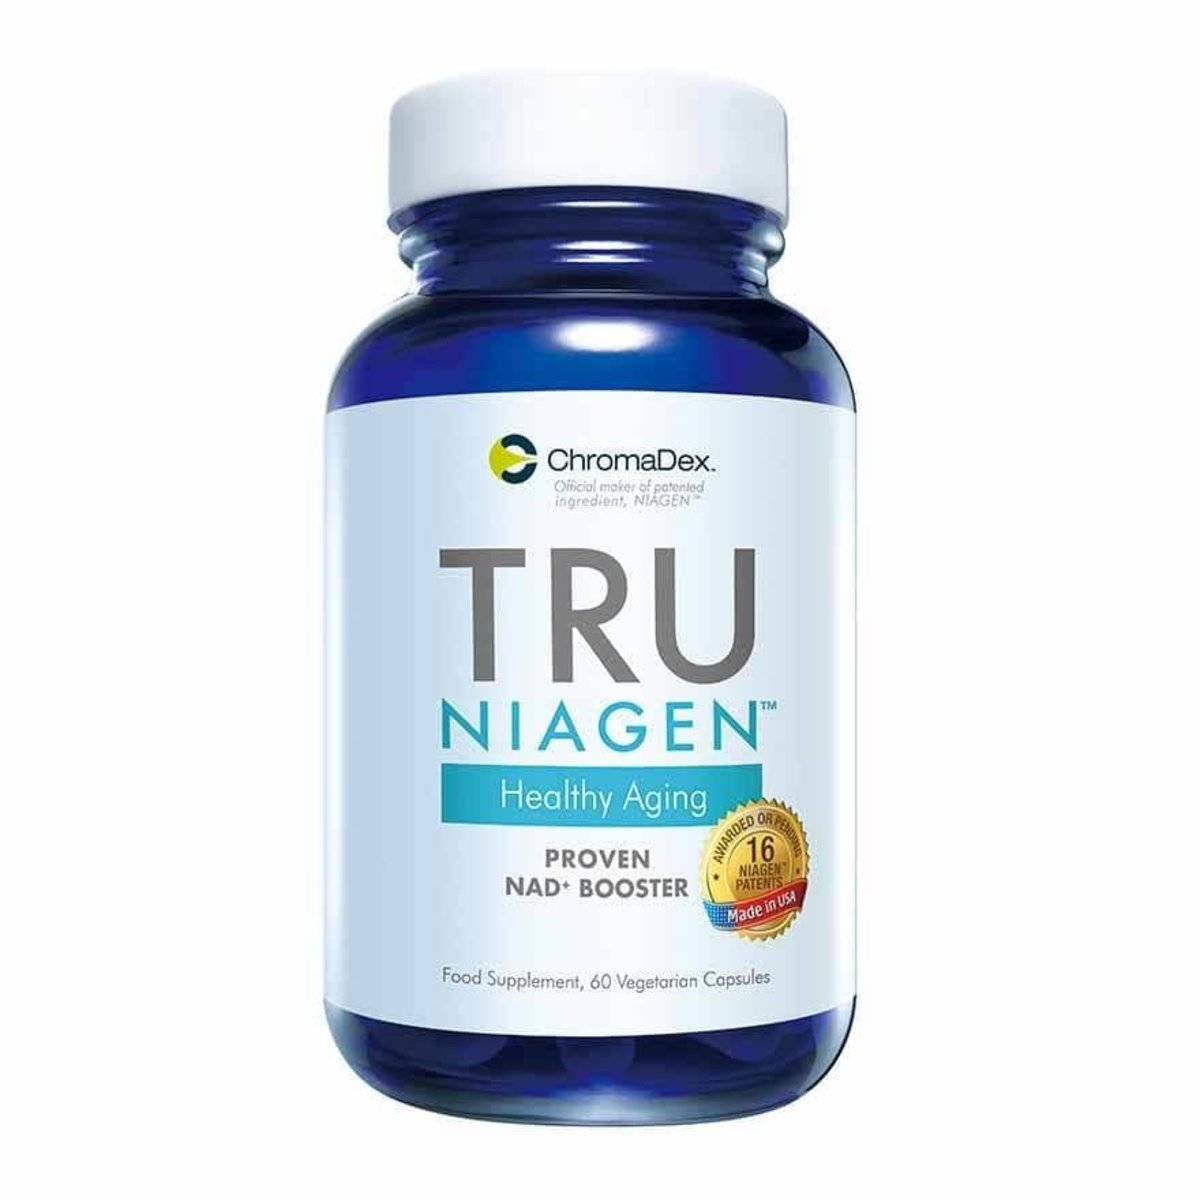 Tru Niagen - [HK Version] Age Better 60 Capsules